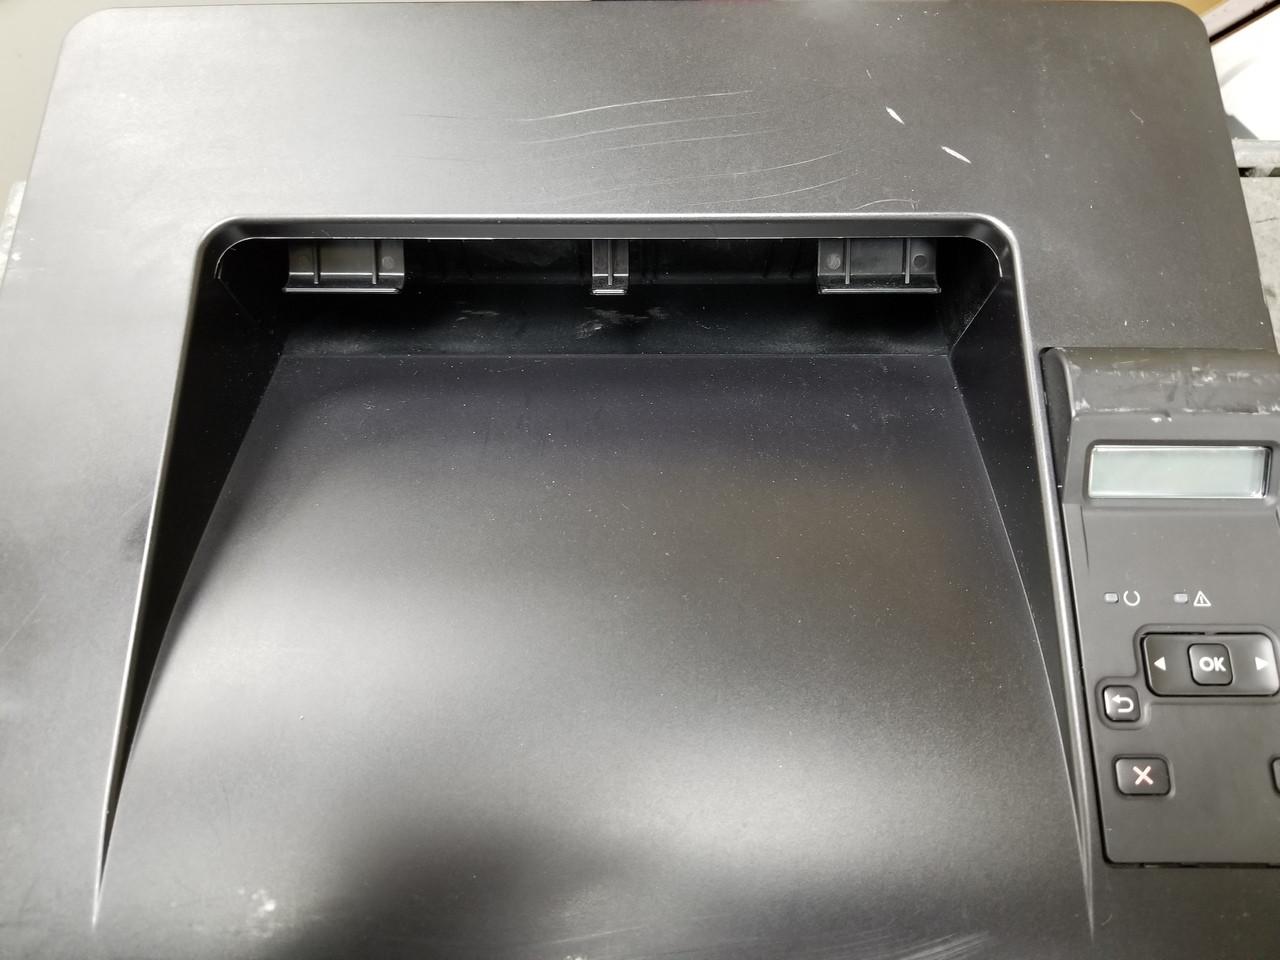 HP LaserJet 400 M401n - CZ195A-USED - HP Laser Printer for sale